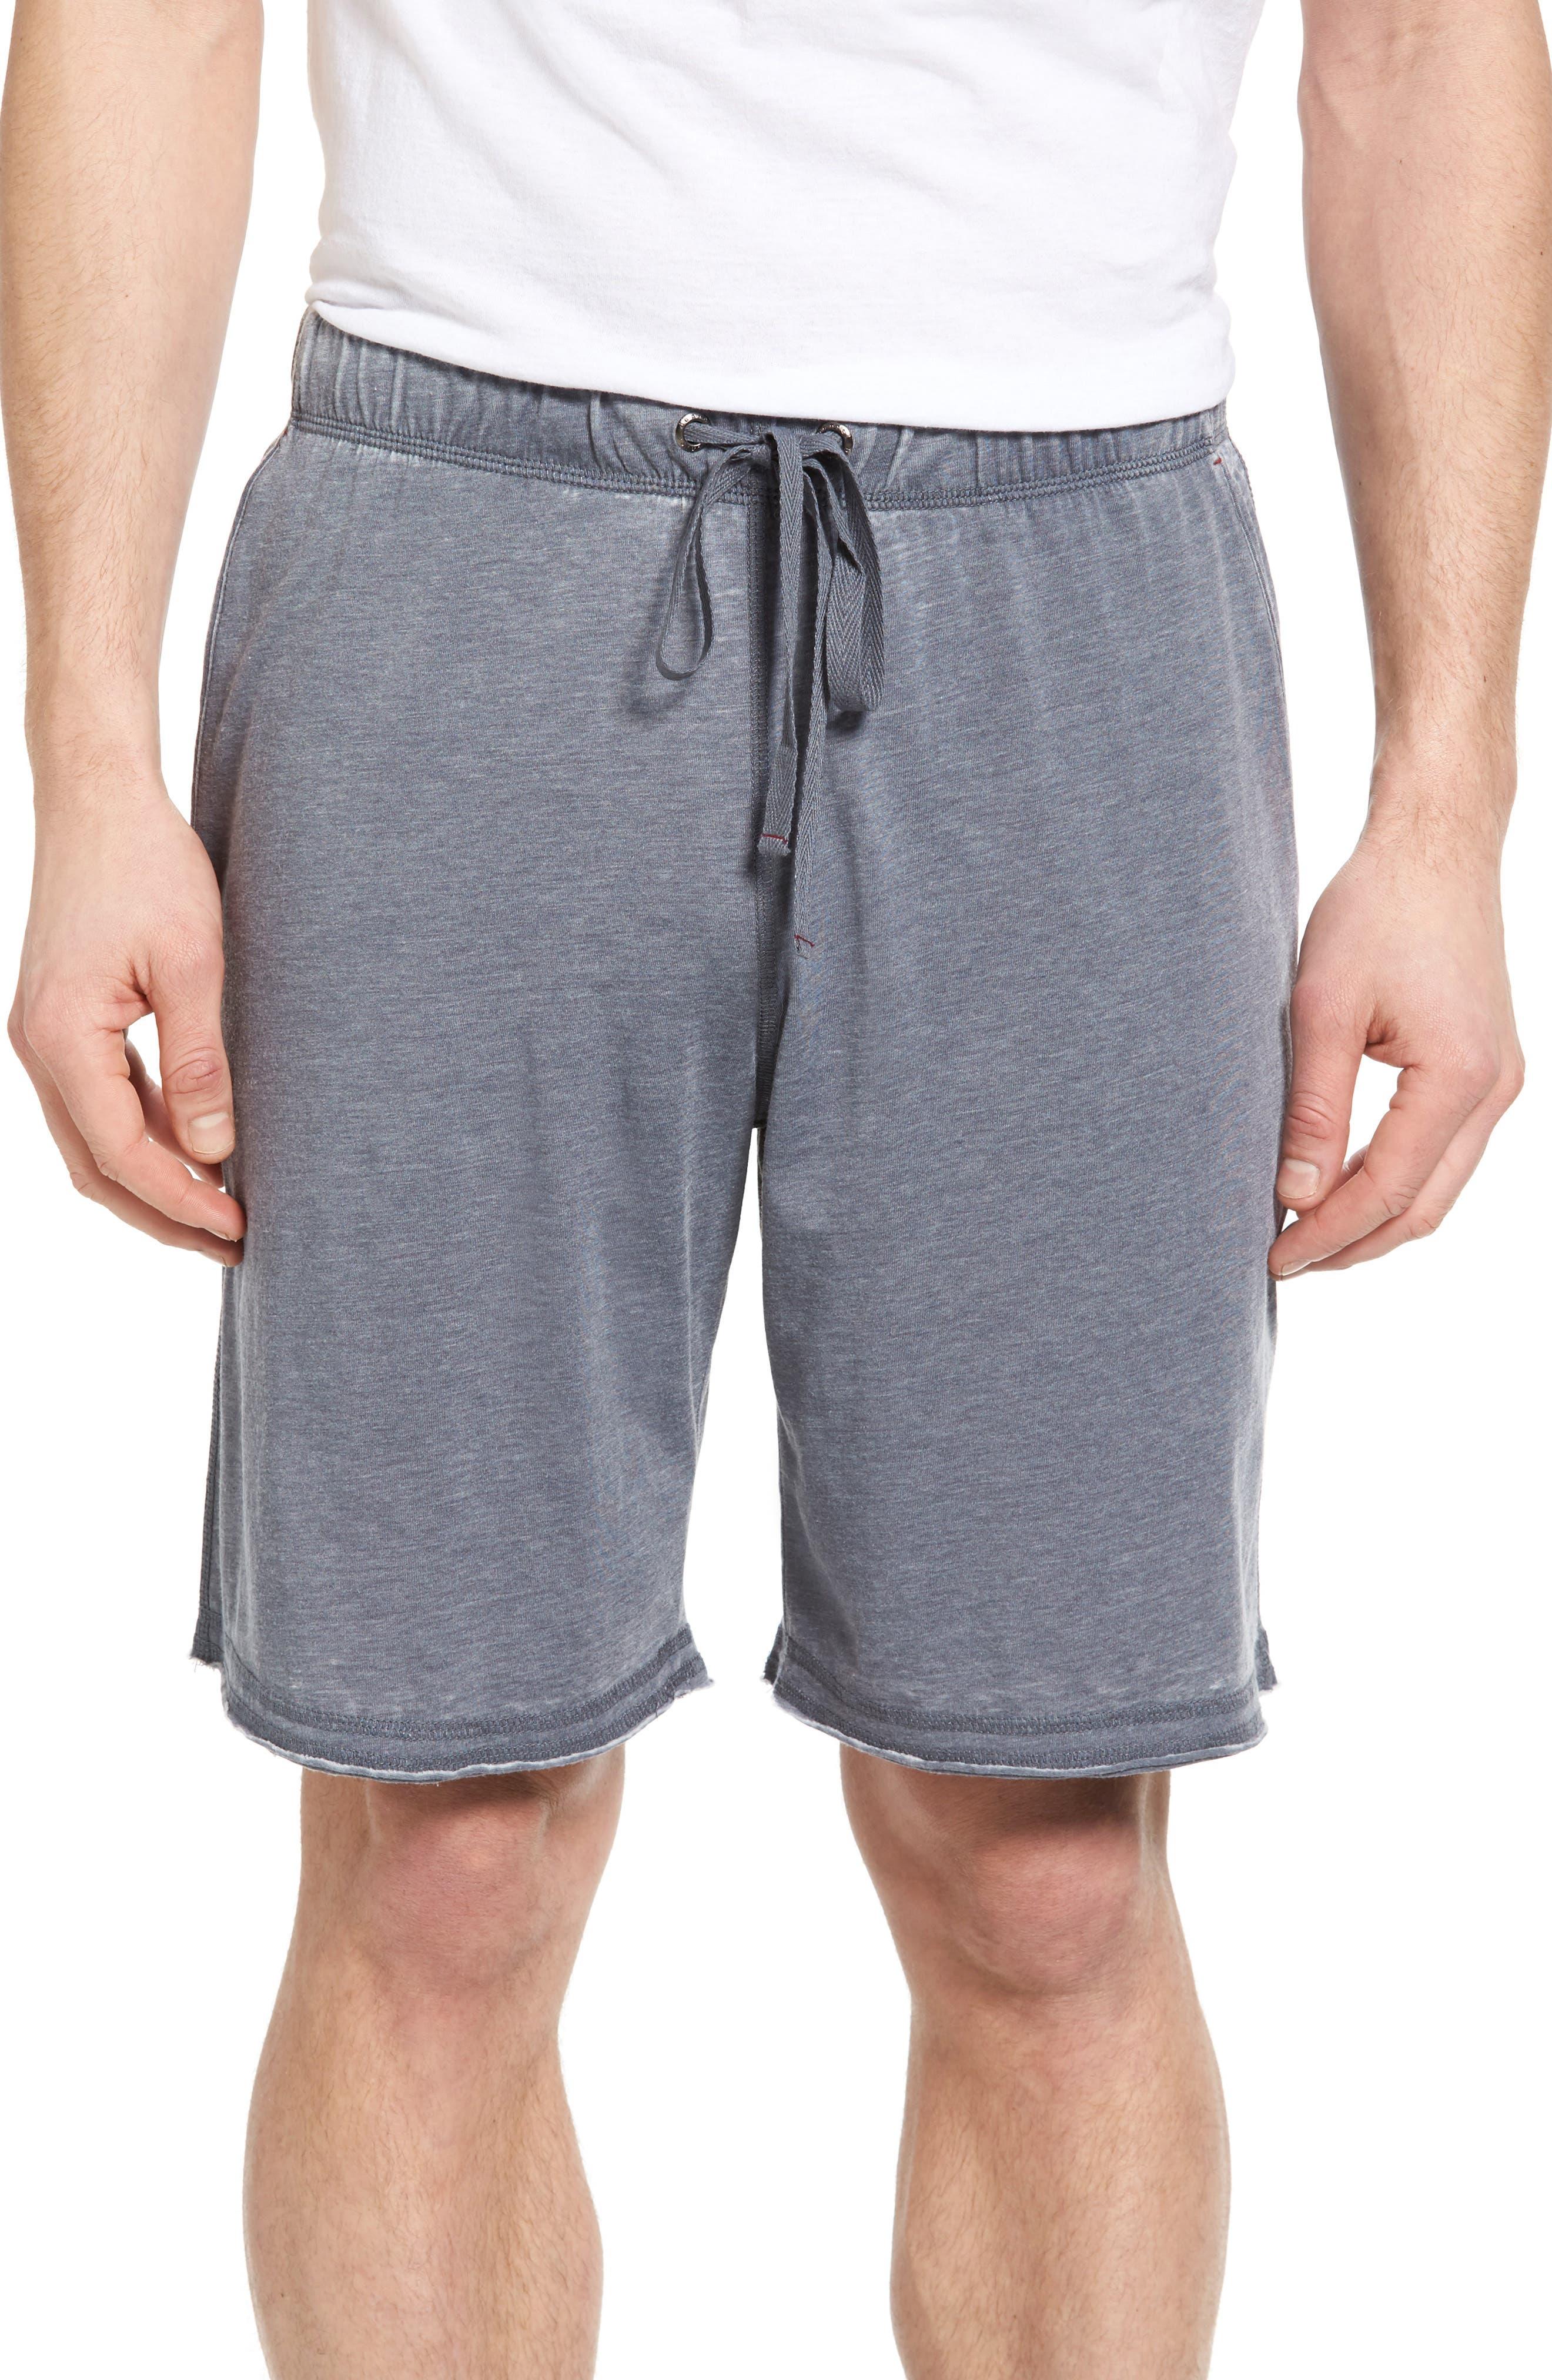 Burnout Lounge Shorts,                             Main thumbnail 1, color,                             Charcoal